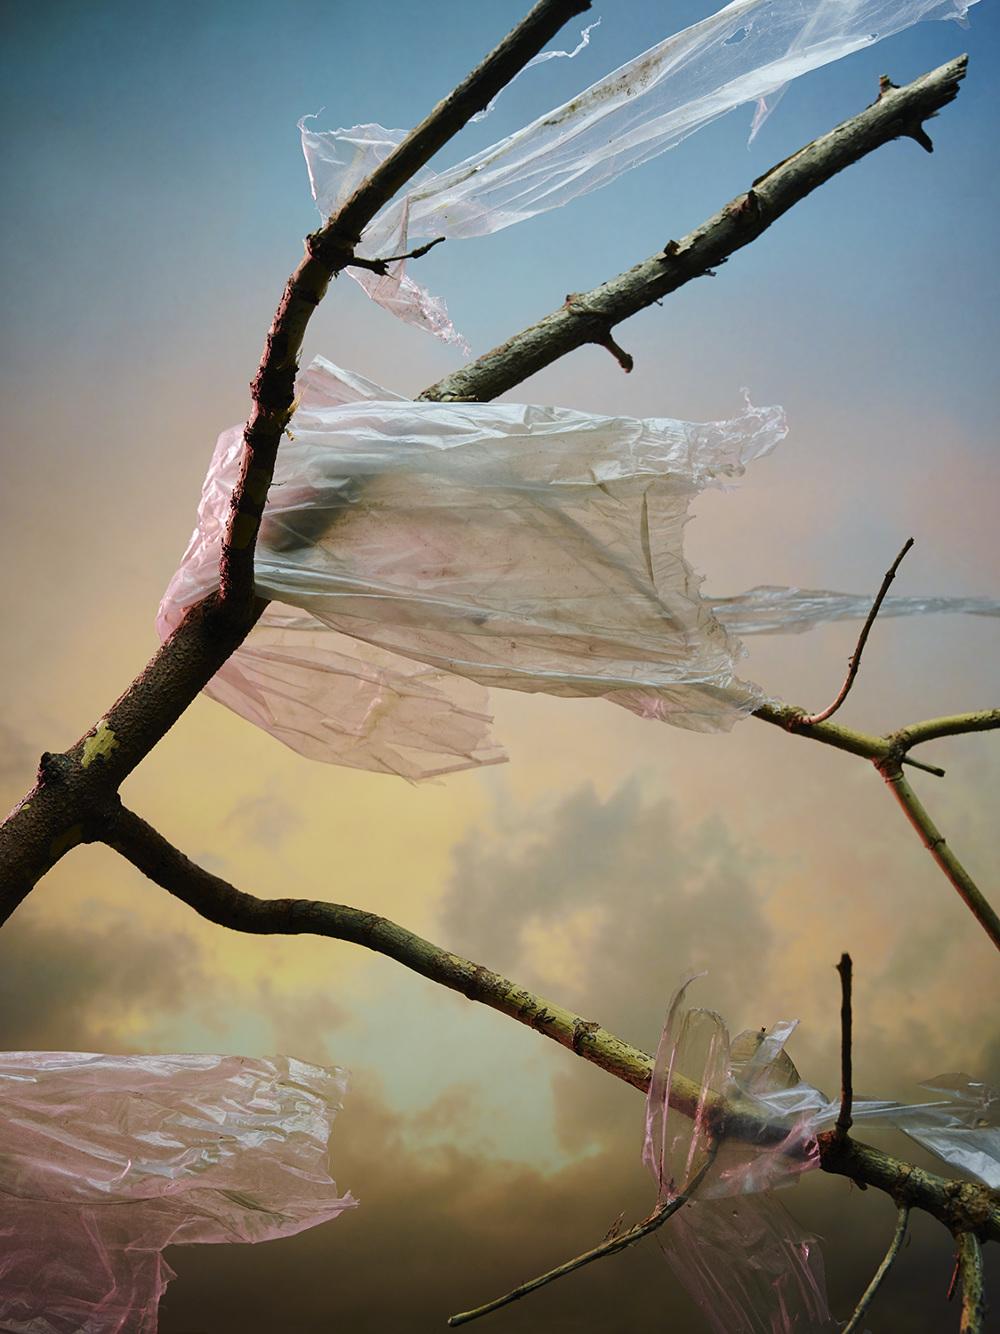 2016-06-15_5761a1c725bde_Plastic-Plastic-Trees_FINAL-Web_1000.jpg